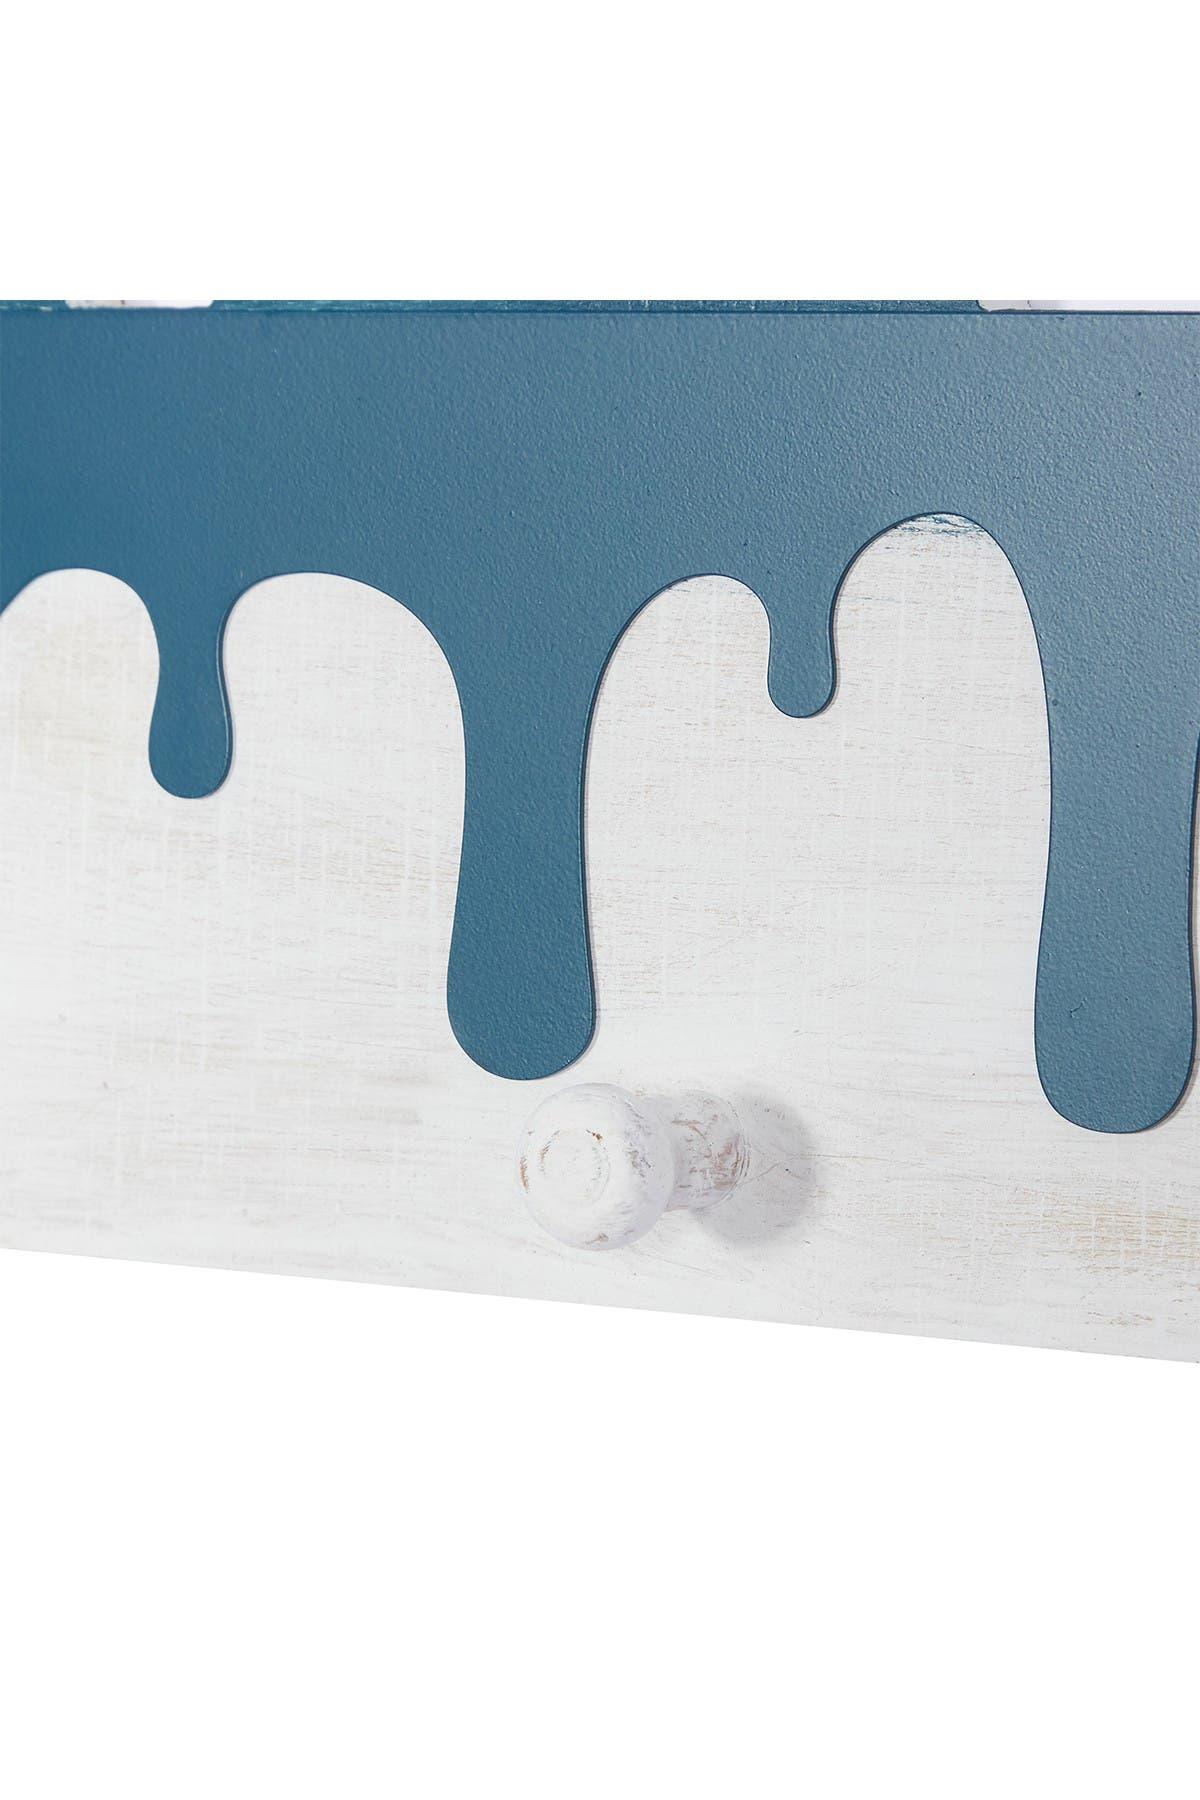 "Image of Willow Row Blue Wood Coastal Wall Hook, 10"" x 19"" x 2"""